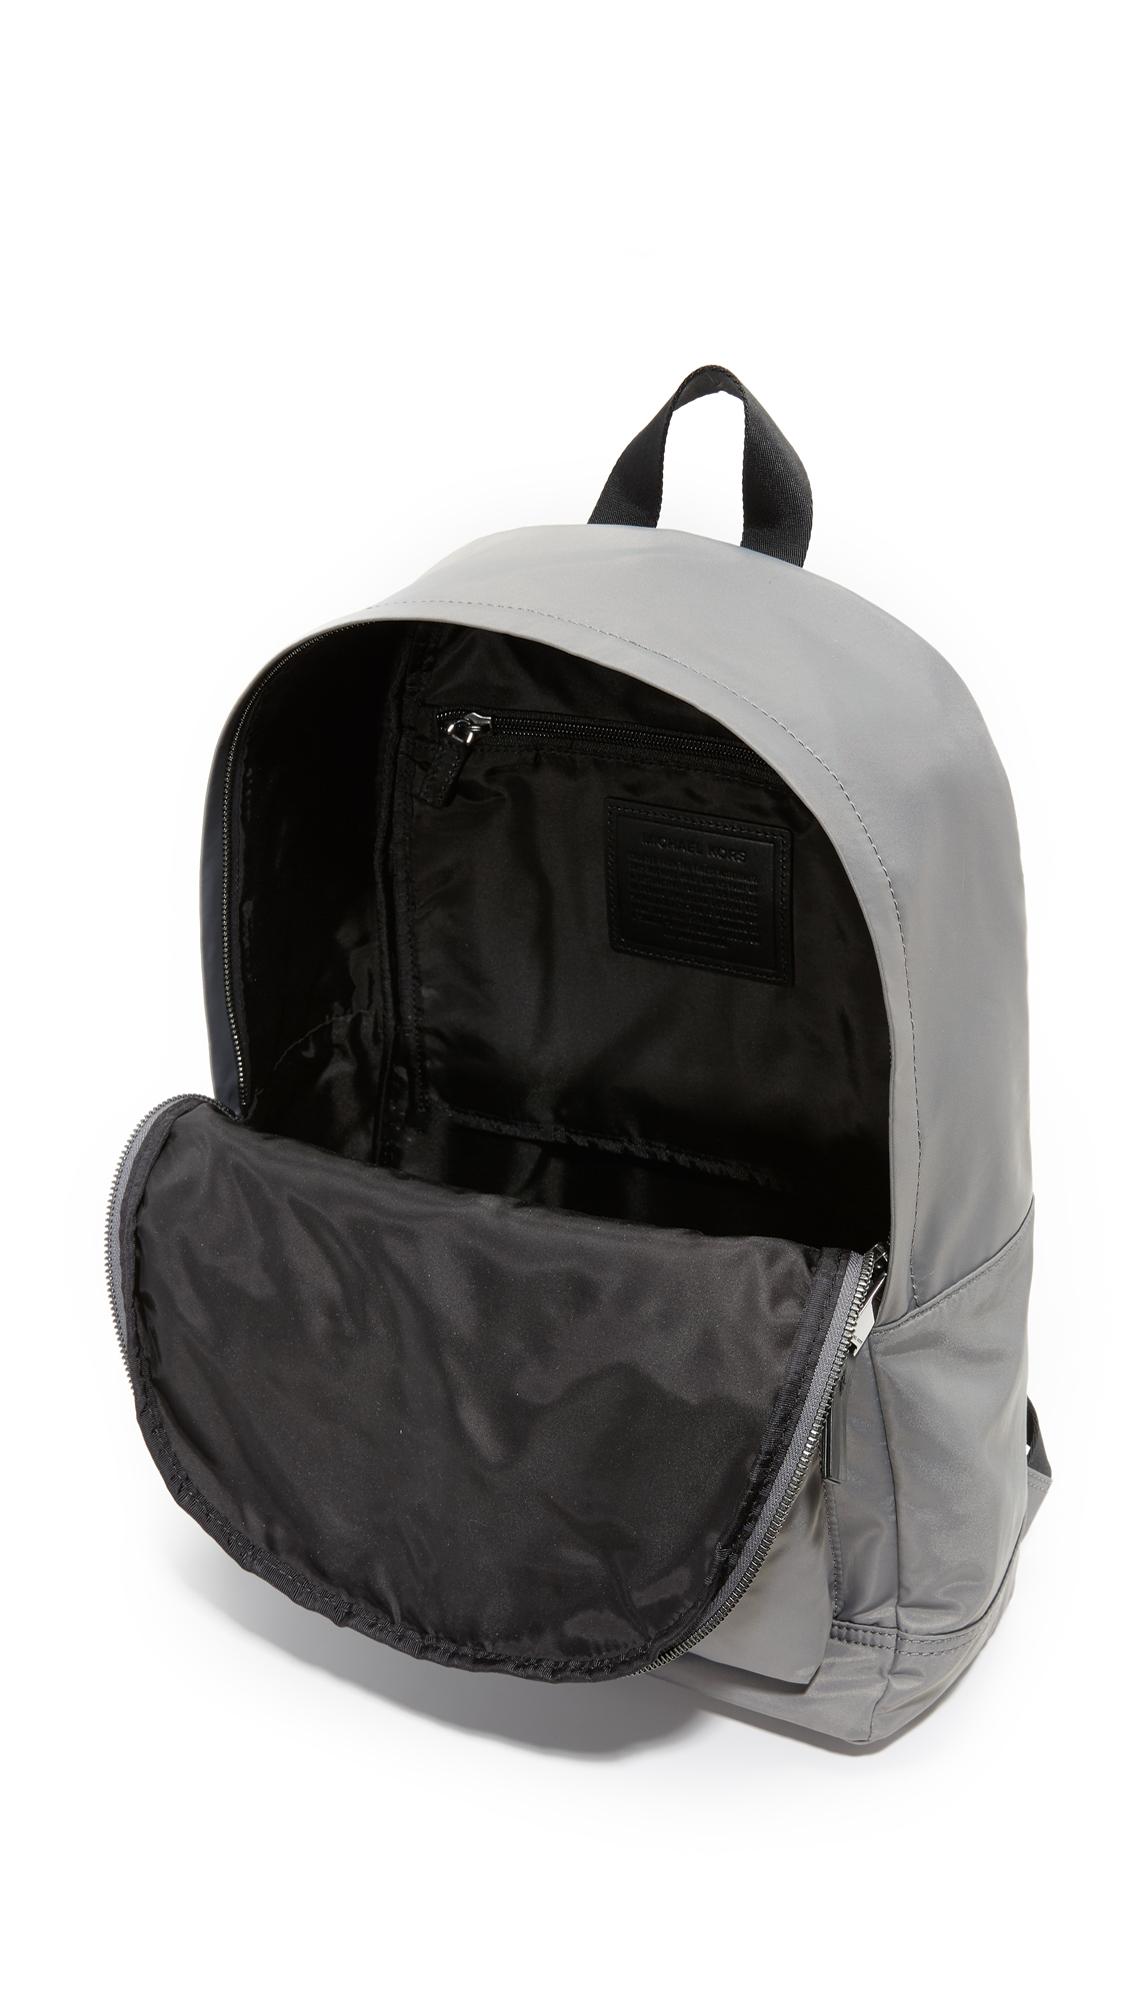 9f847f546603 Michael Kors Kent Nylon Backpack | EAST DANE